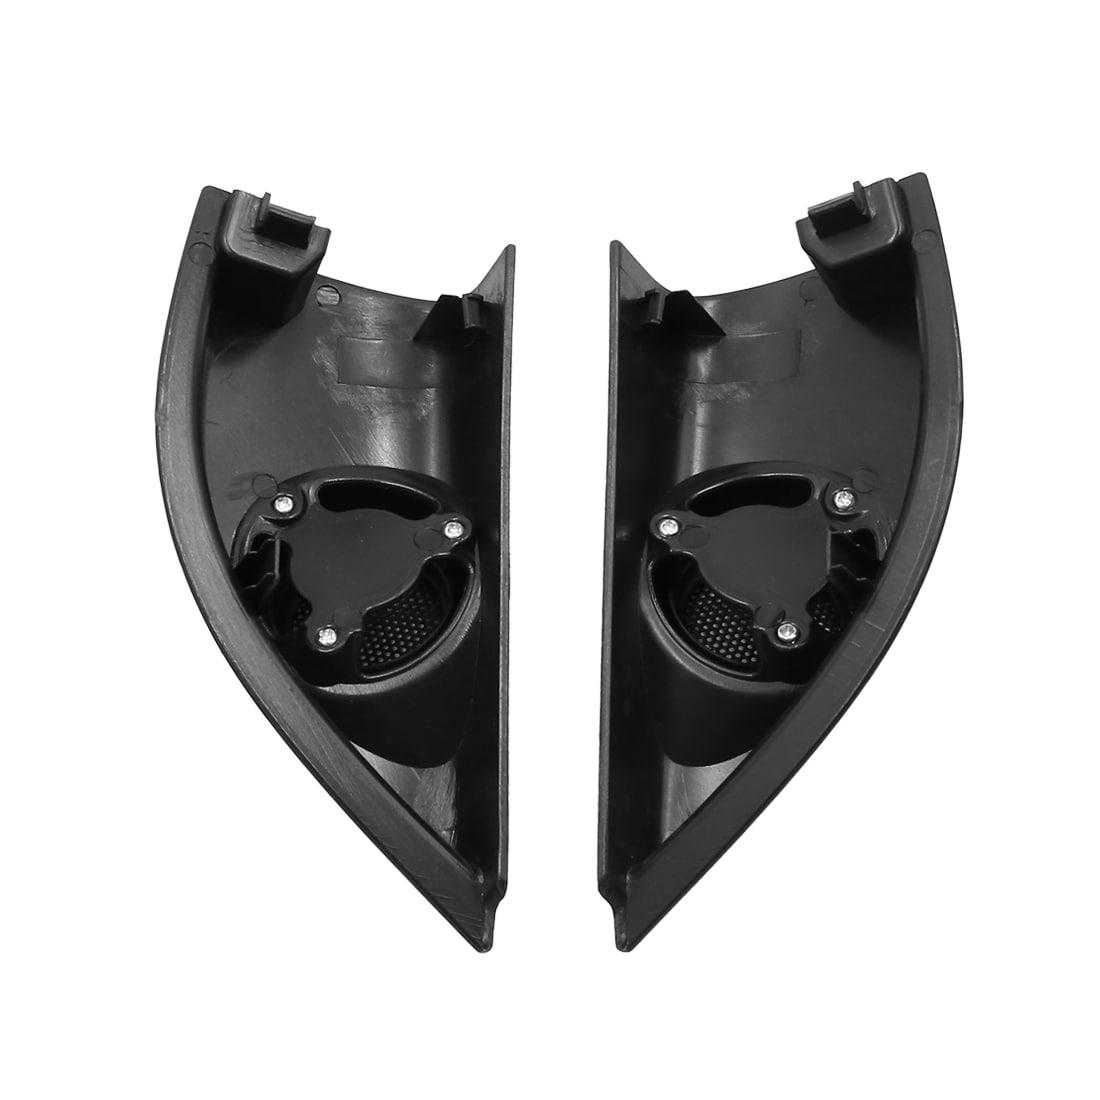 uxcell Pair Black Car Speaker Trim Cover Tweeter Protector for Honda CRV 2012-2016